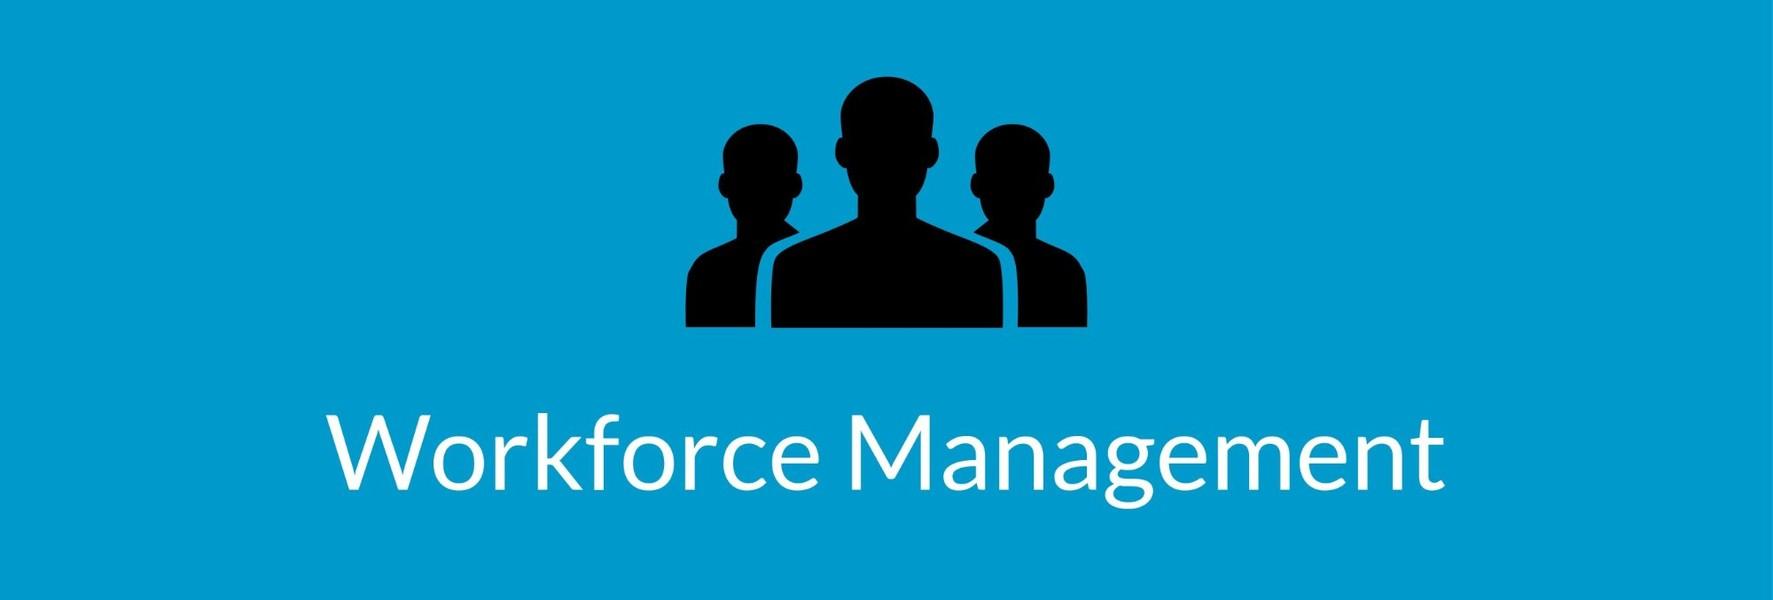 workforce certifications